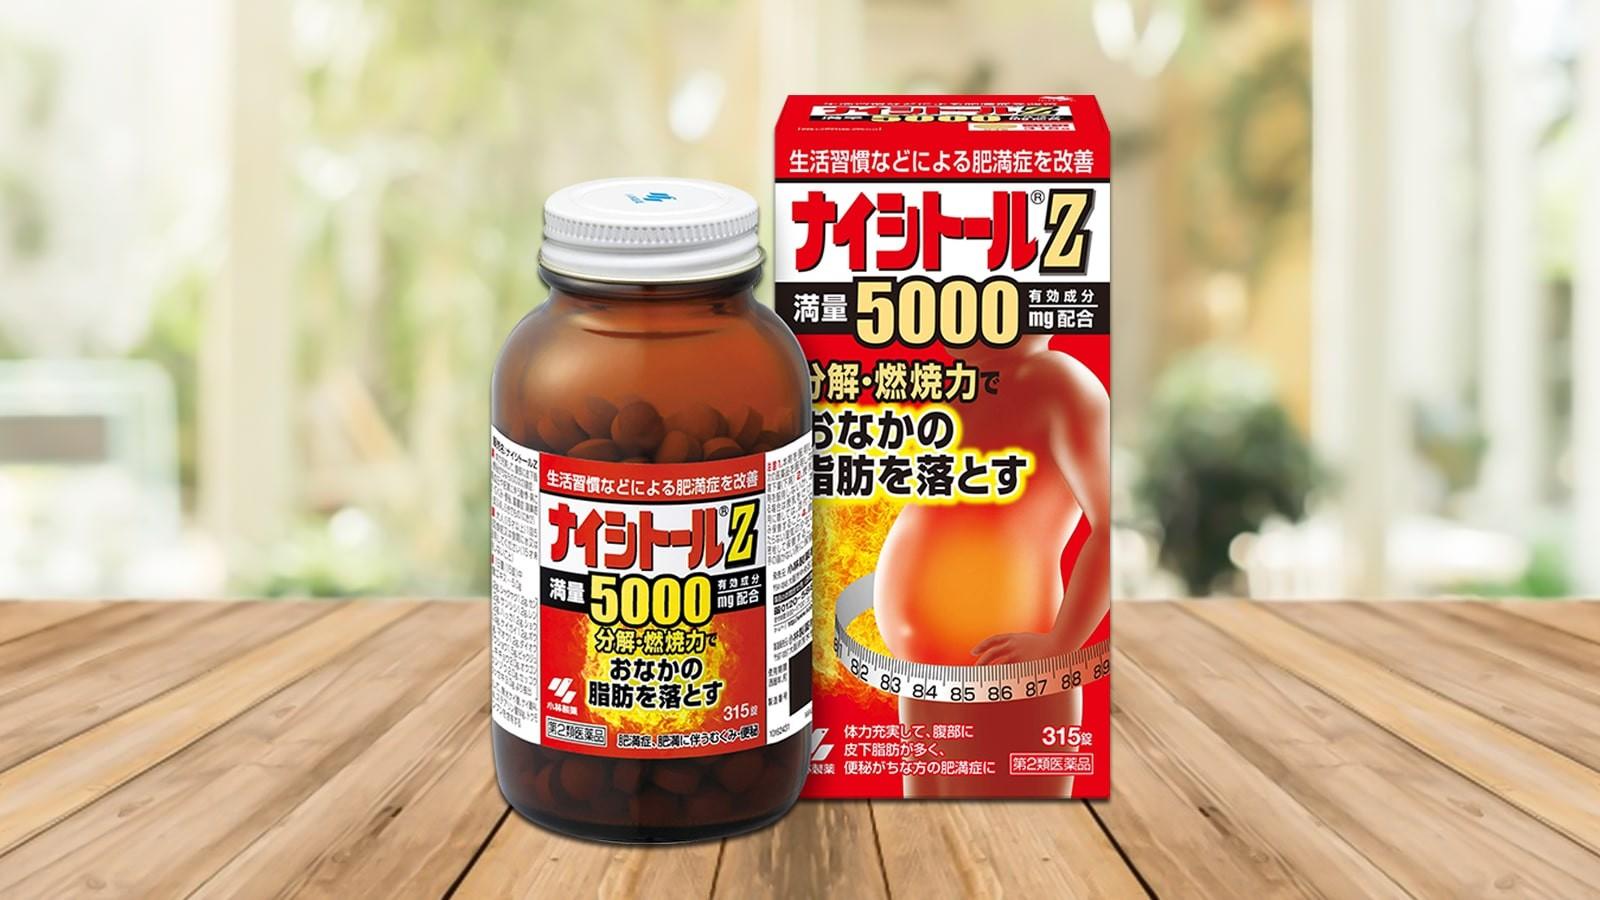 Viên uống giảm cân Kobayashi